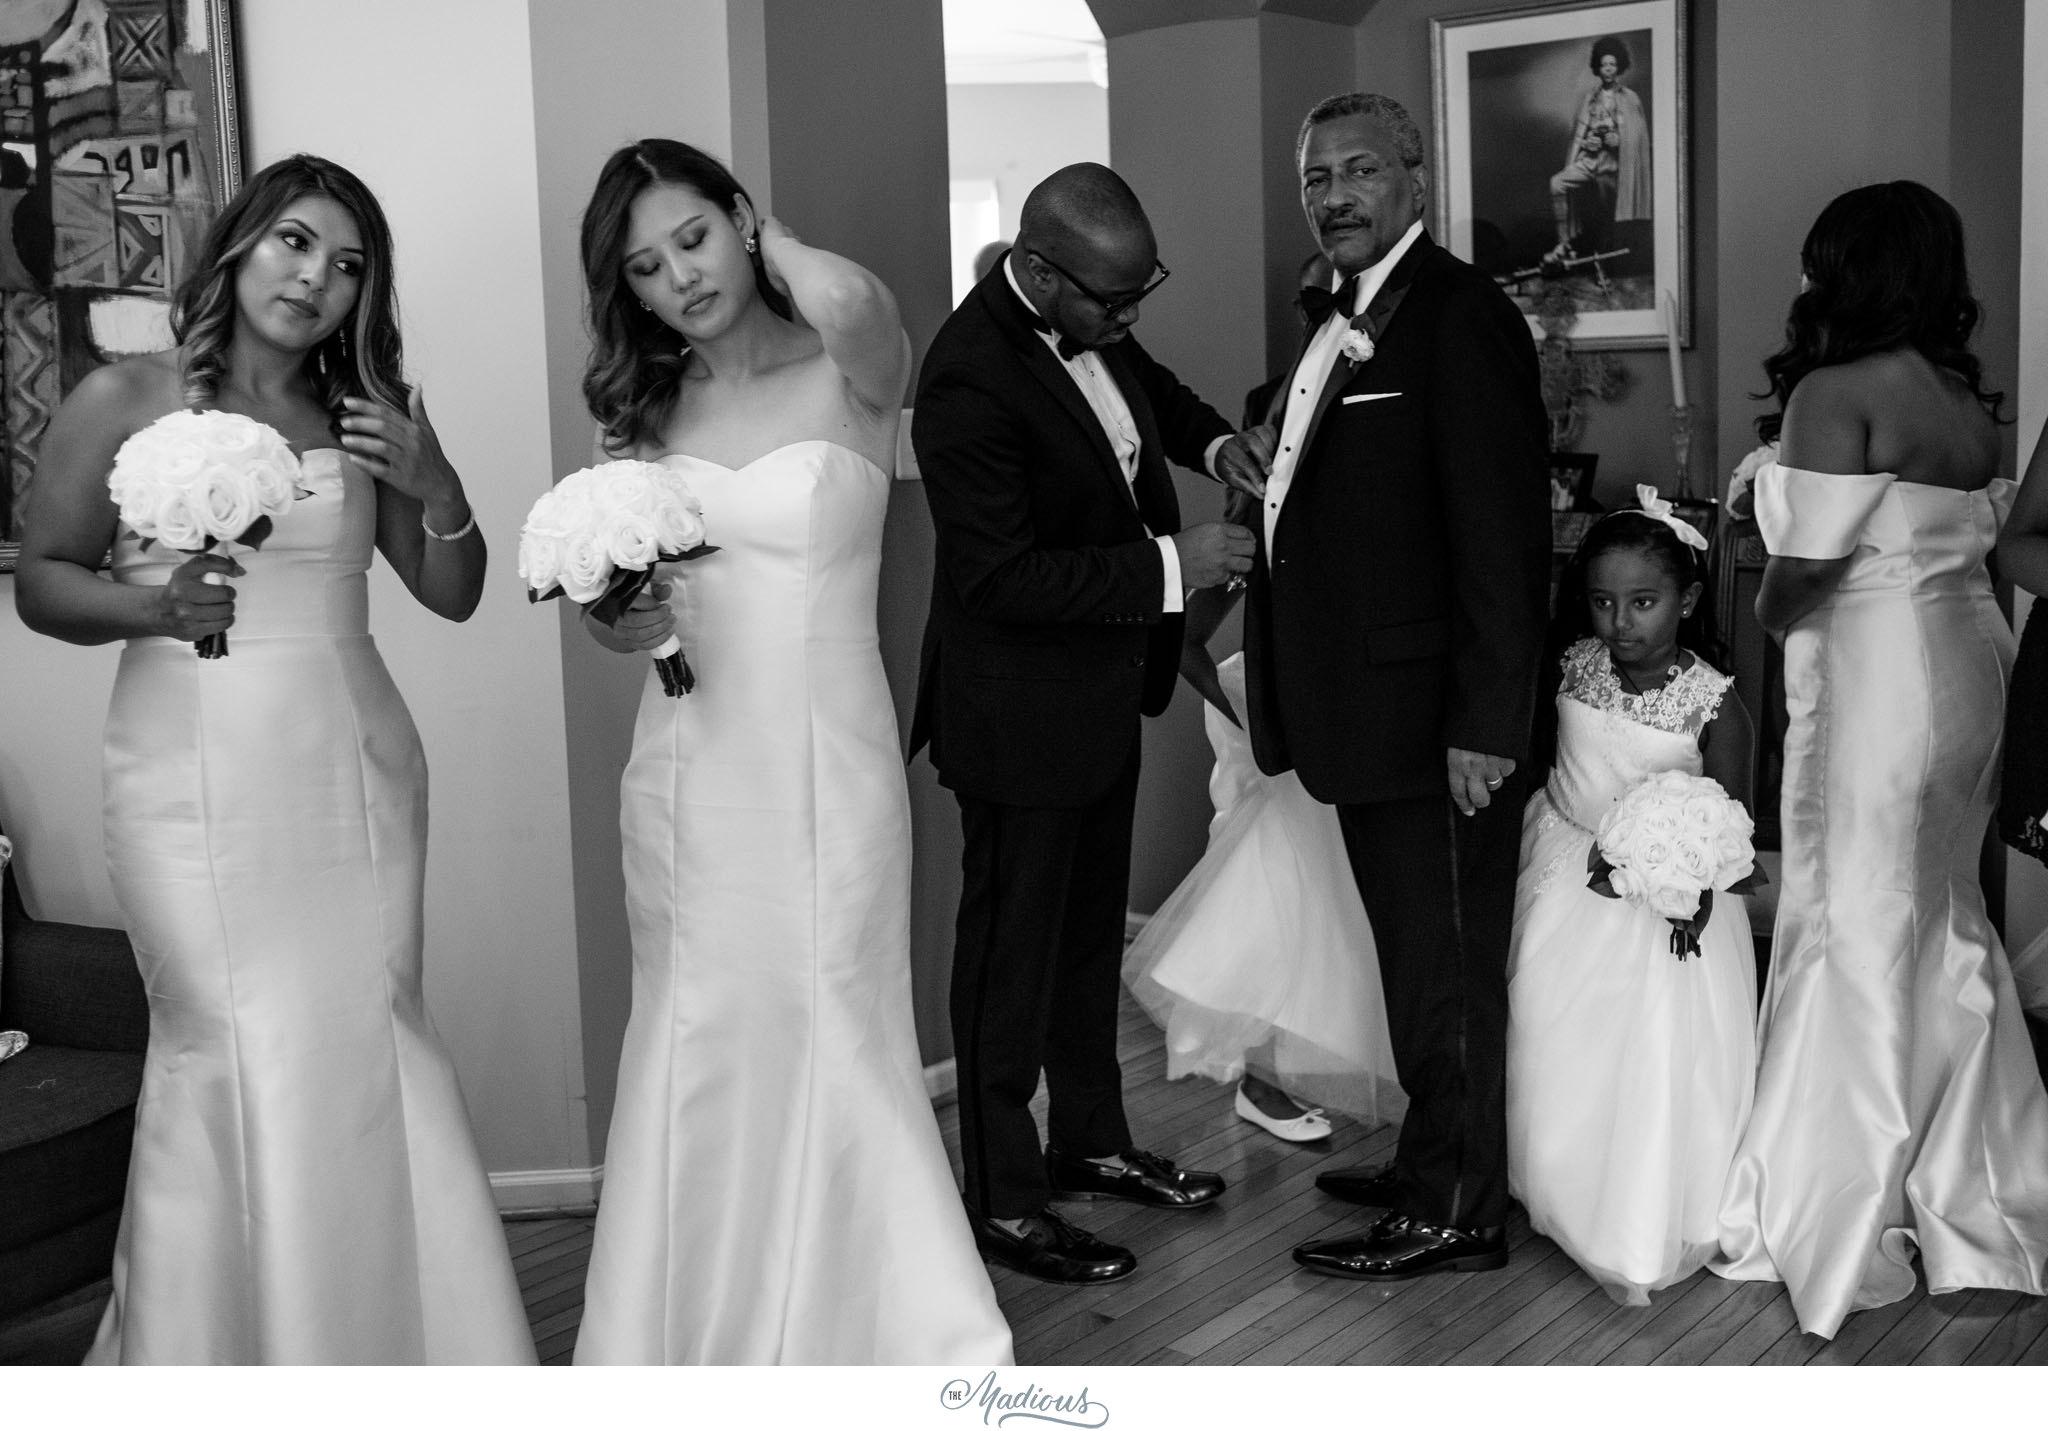 nmwa+wedding,+women+in+the+arts+wedding,+ethiopian+wedding,+dc+wedding+0036.jpg